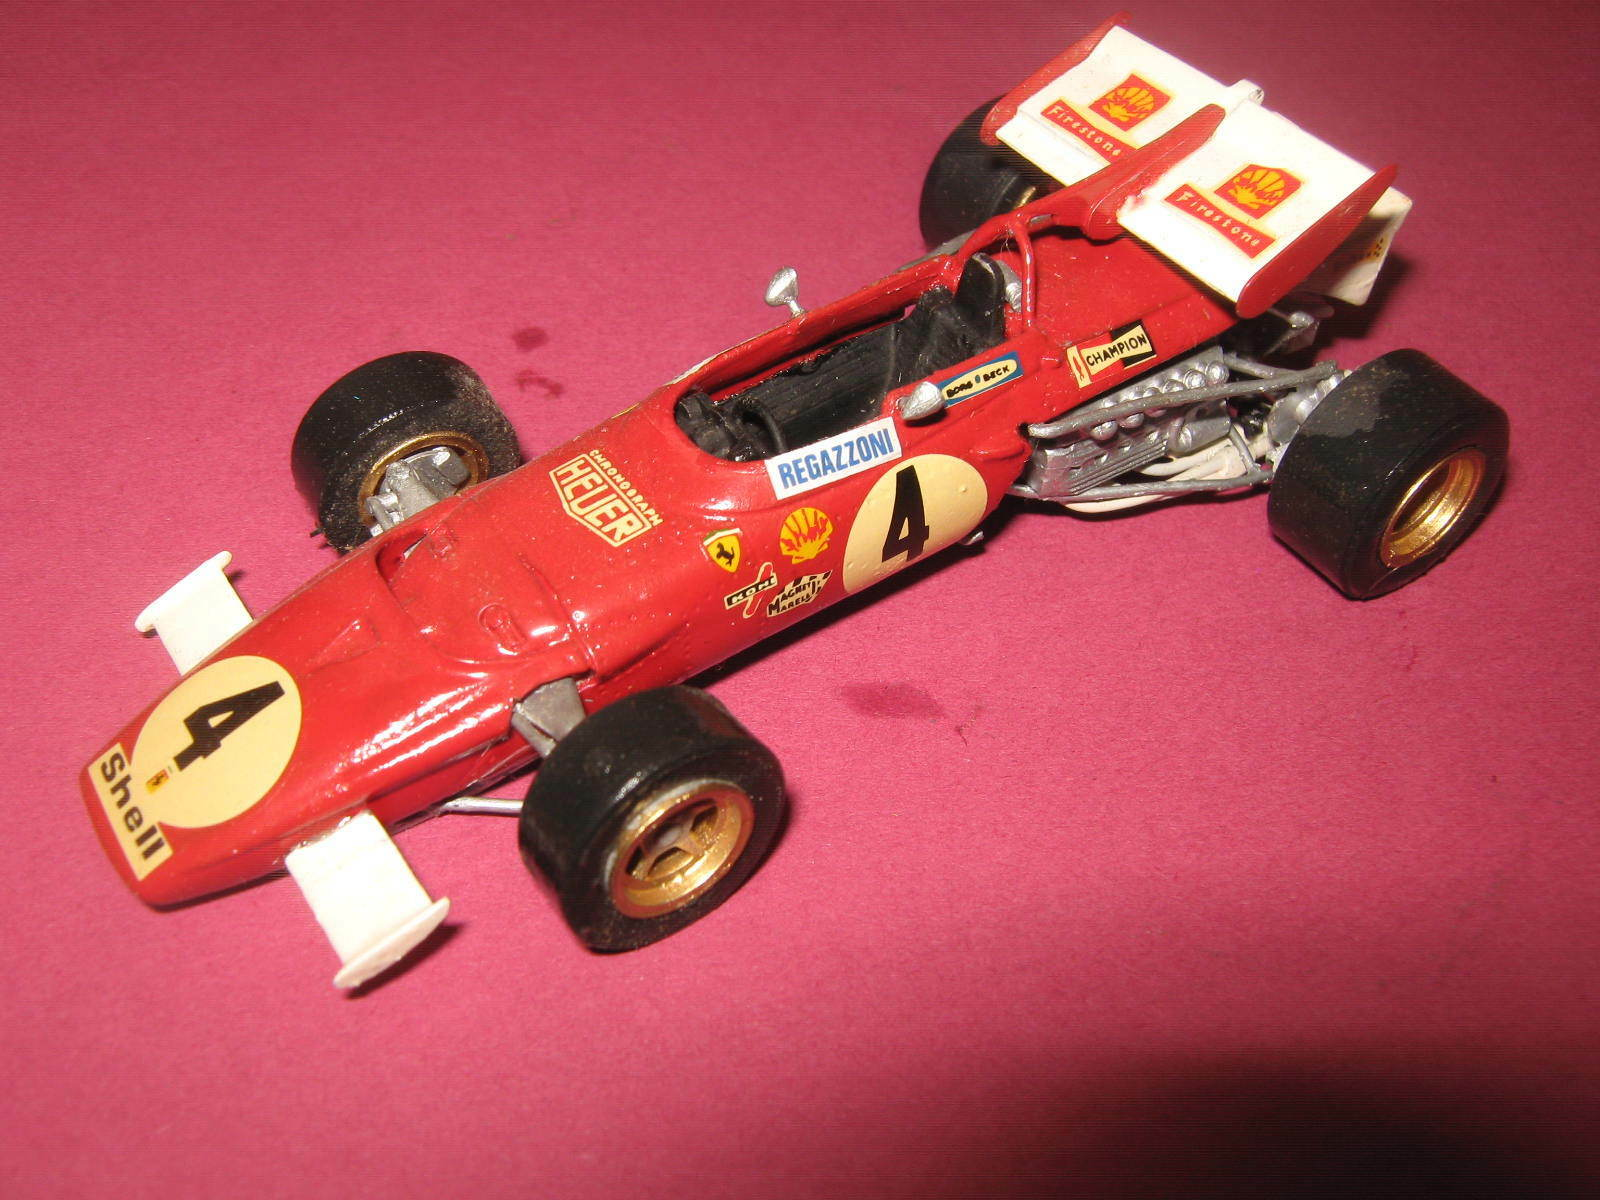 1 43 Ferrari 312b C. REGAZZONI 1970 Racing line handbuilt Car in Display Cabinet